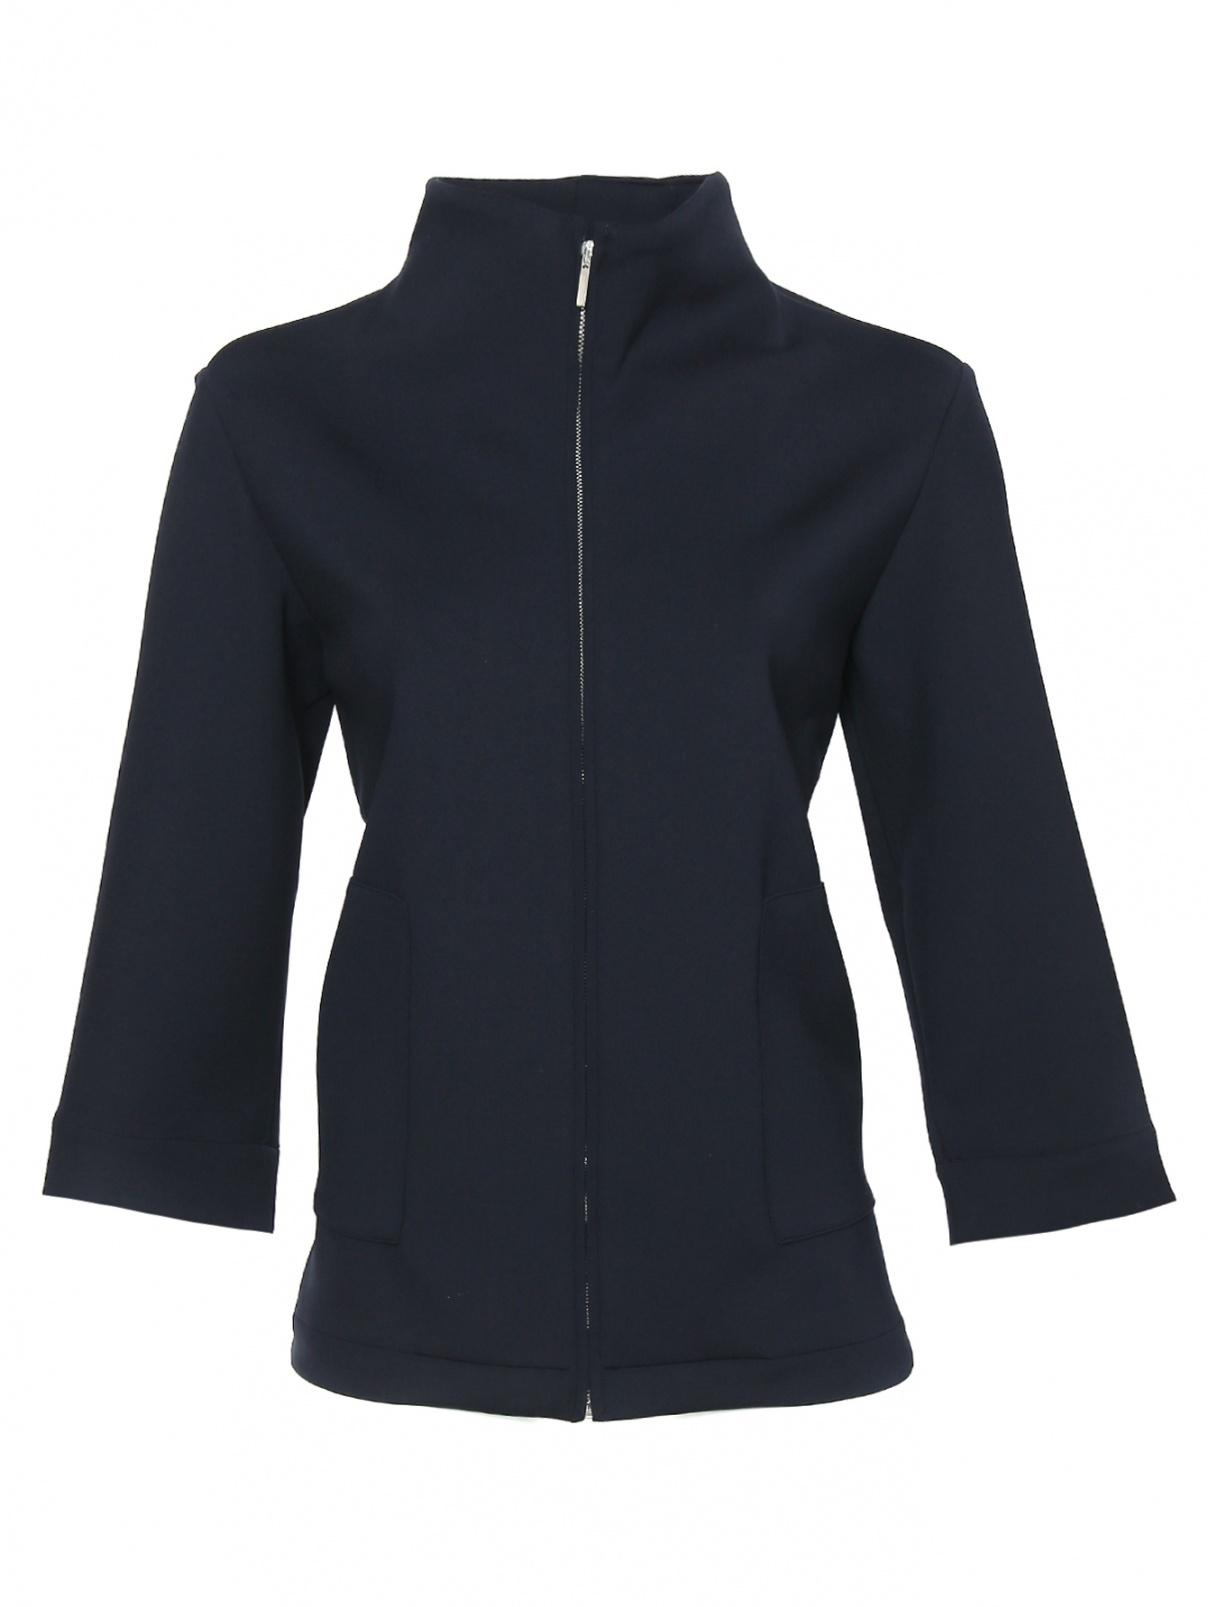 Жакет на молнии с карманами Marina Rinaldi  –  Общий вид